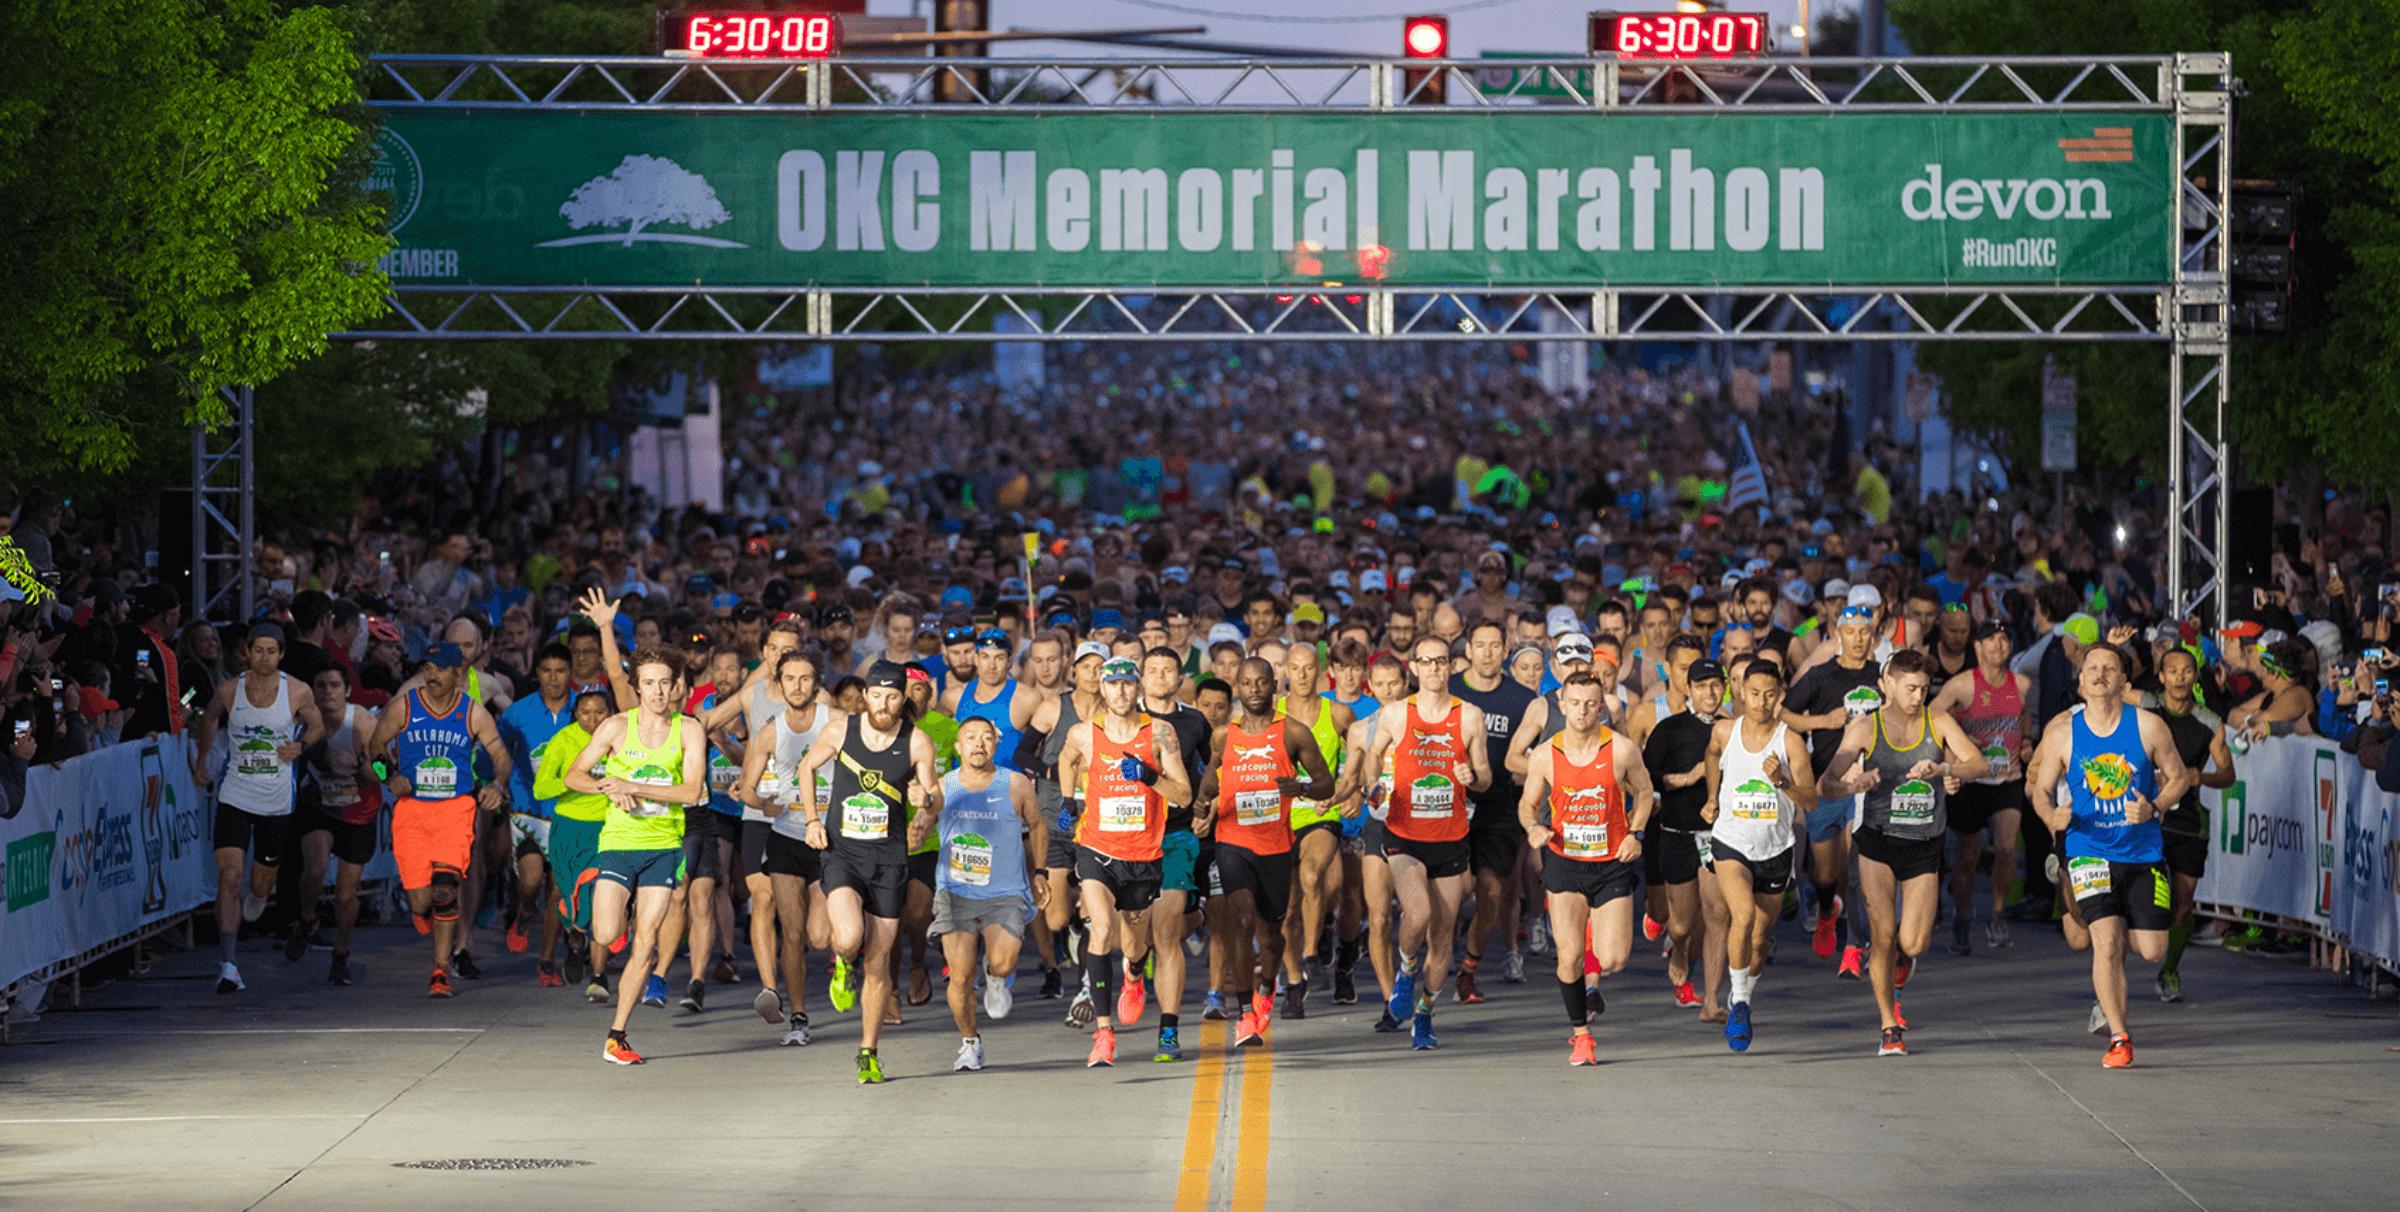 Oklahoma City Memorial Marathon – The RUN to REMEMBER